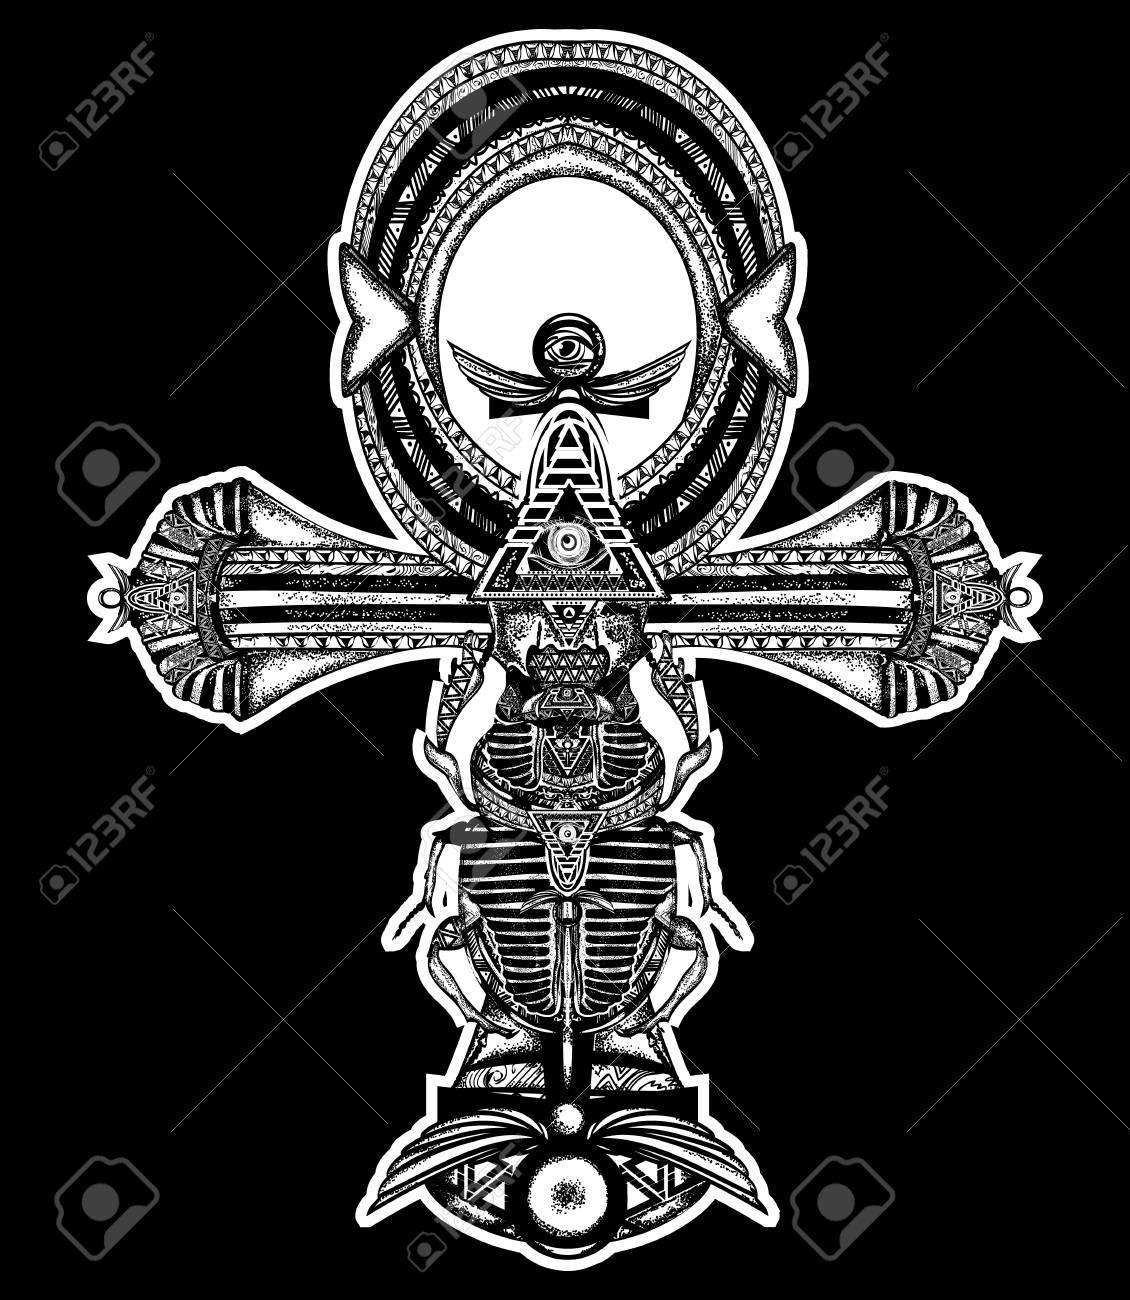 Ankh tattoo ancient egyptian cross t shirt design decorative ankh tattoo ancient egyptian cross t shirt design decorative ethnic style of ancient buycottarizona Image collections